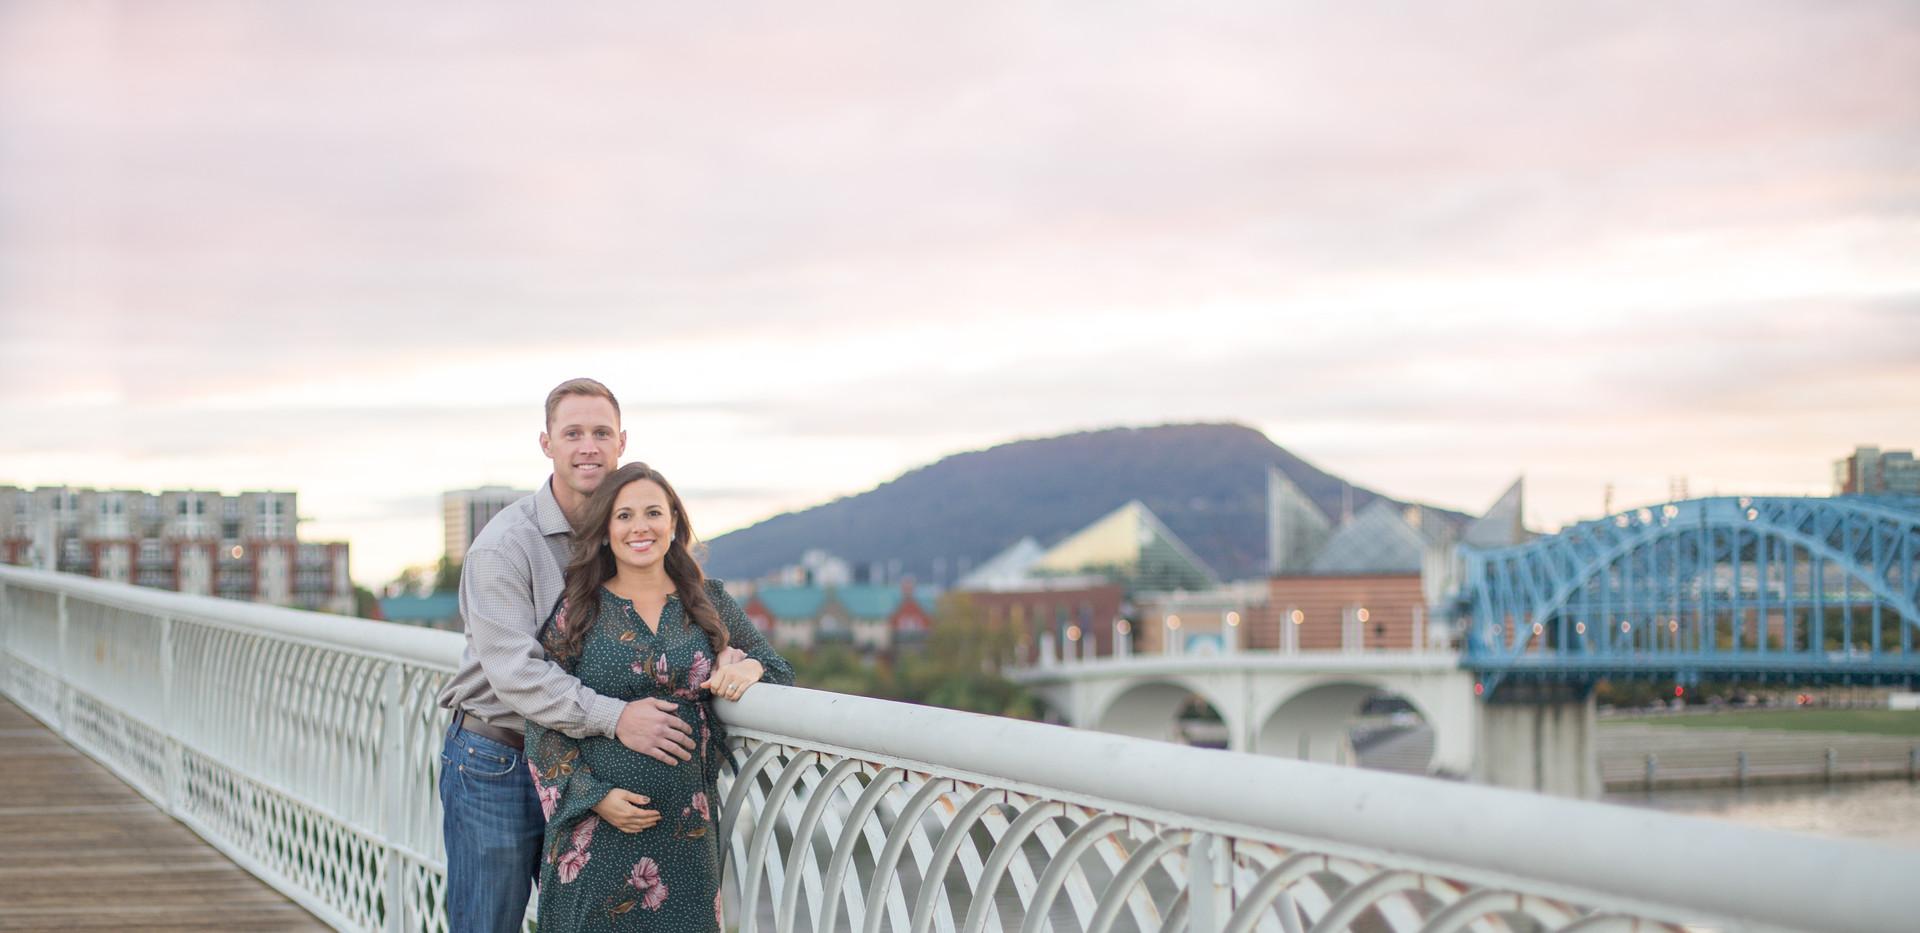 expecting parents Chattanooga, Wlanut Street Bridge